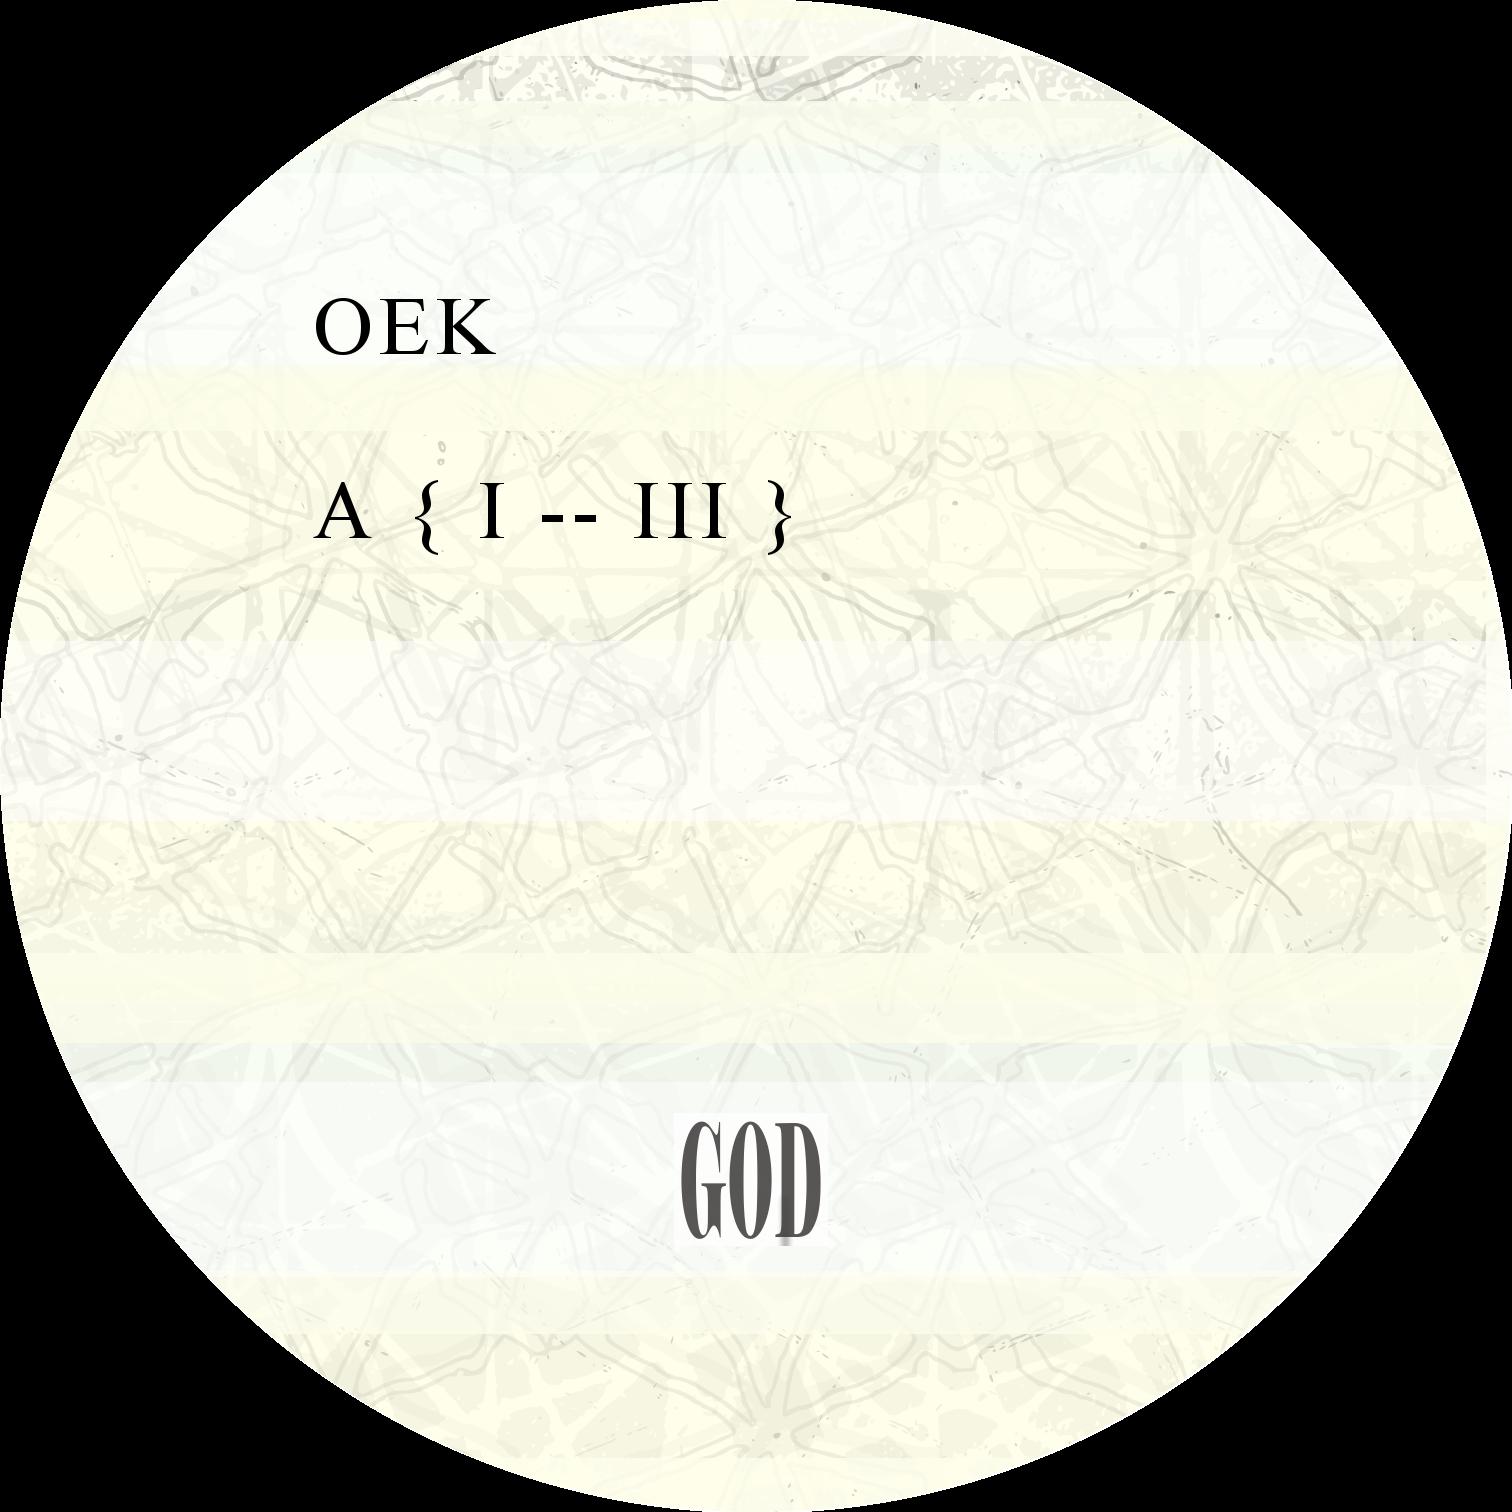 Label a